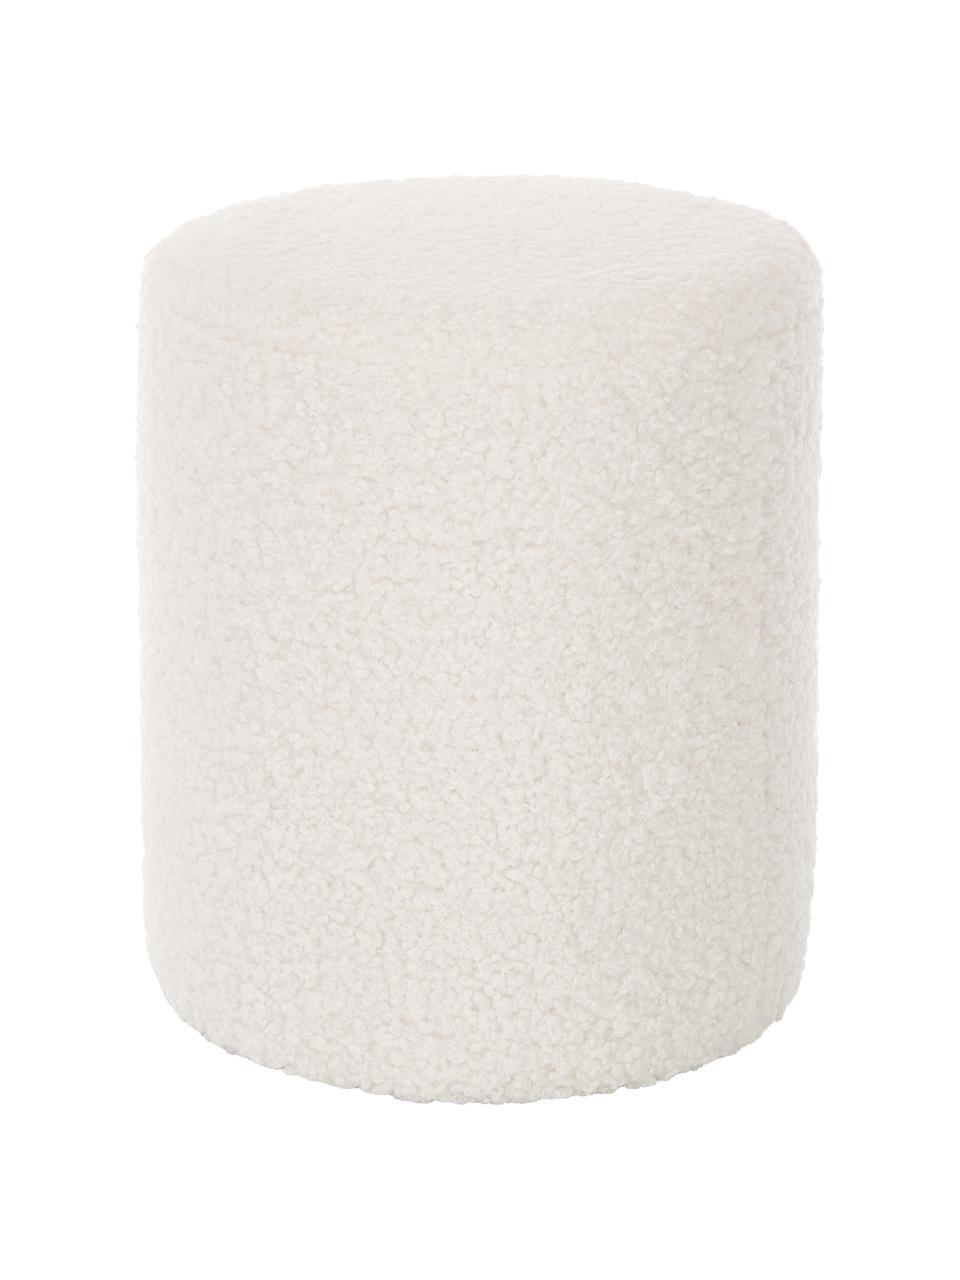 Pouf blanc peluche Daisy, Peluche blanc crème